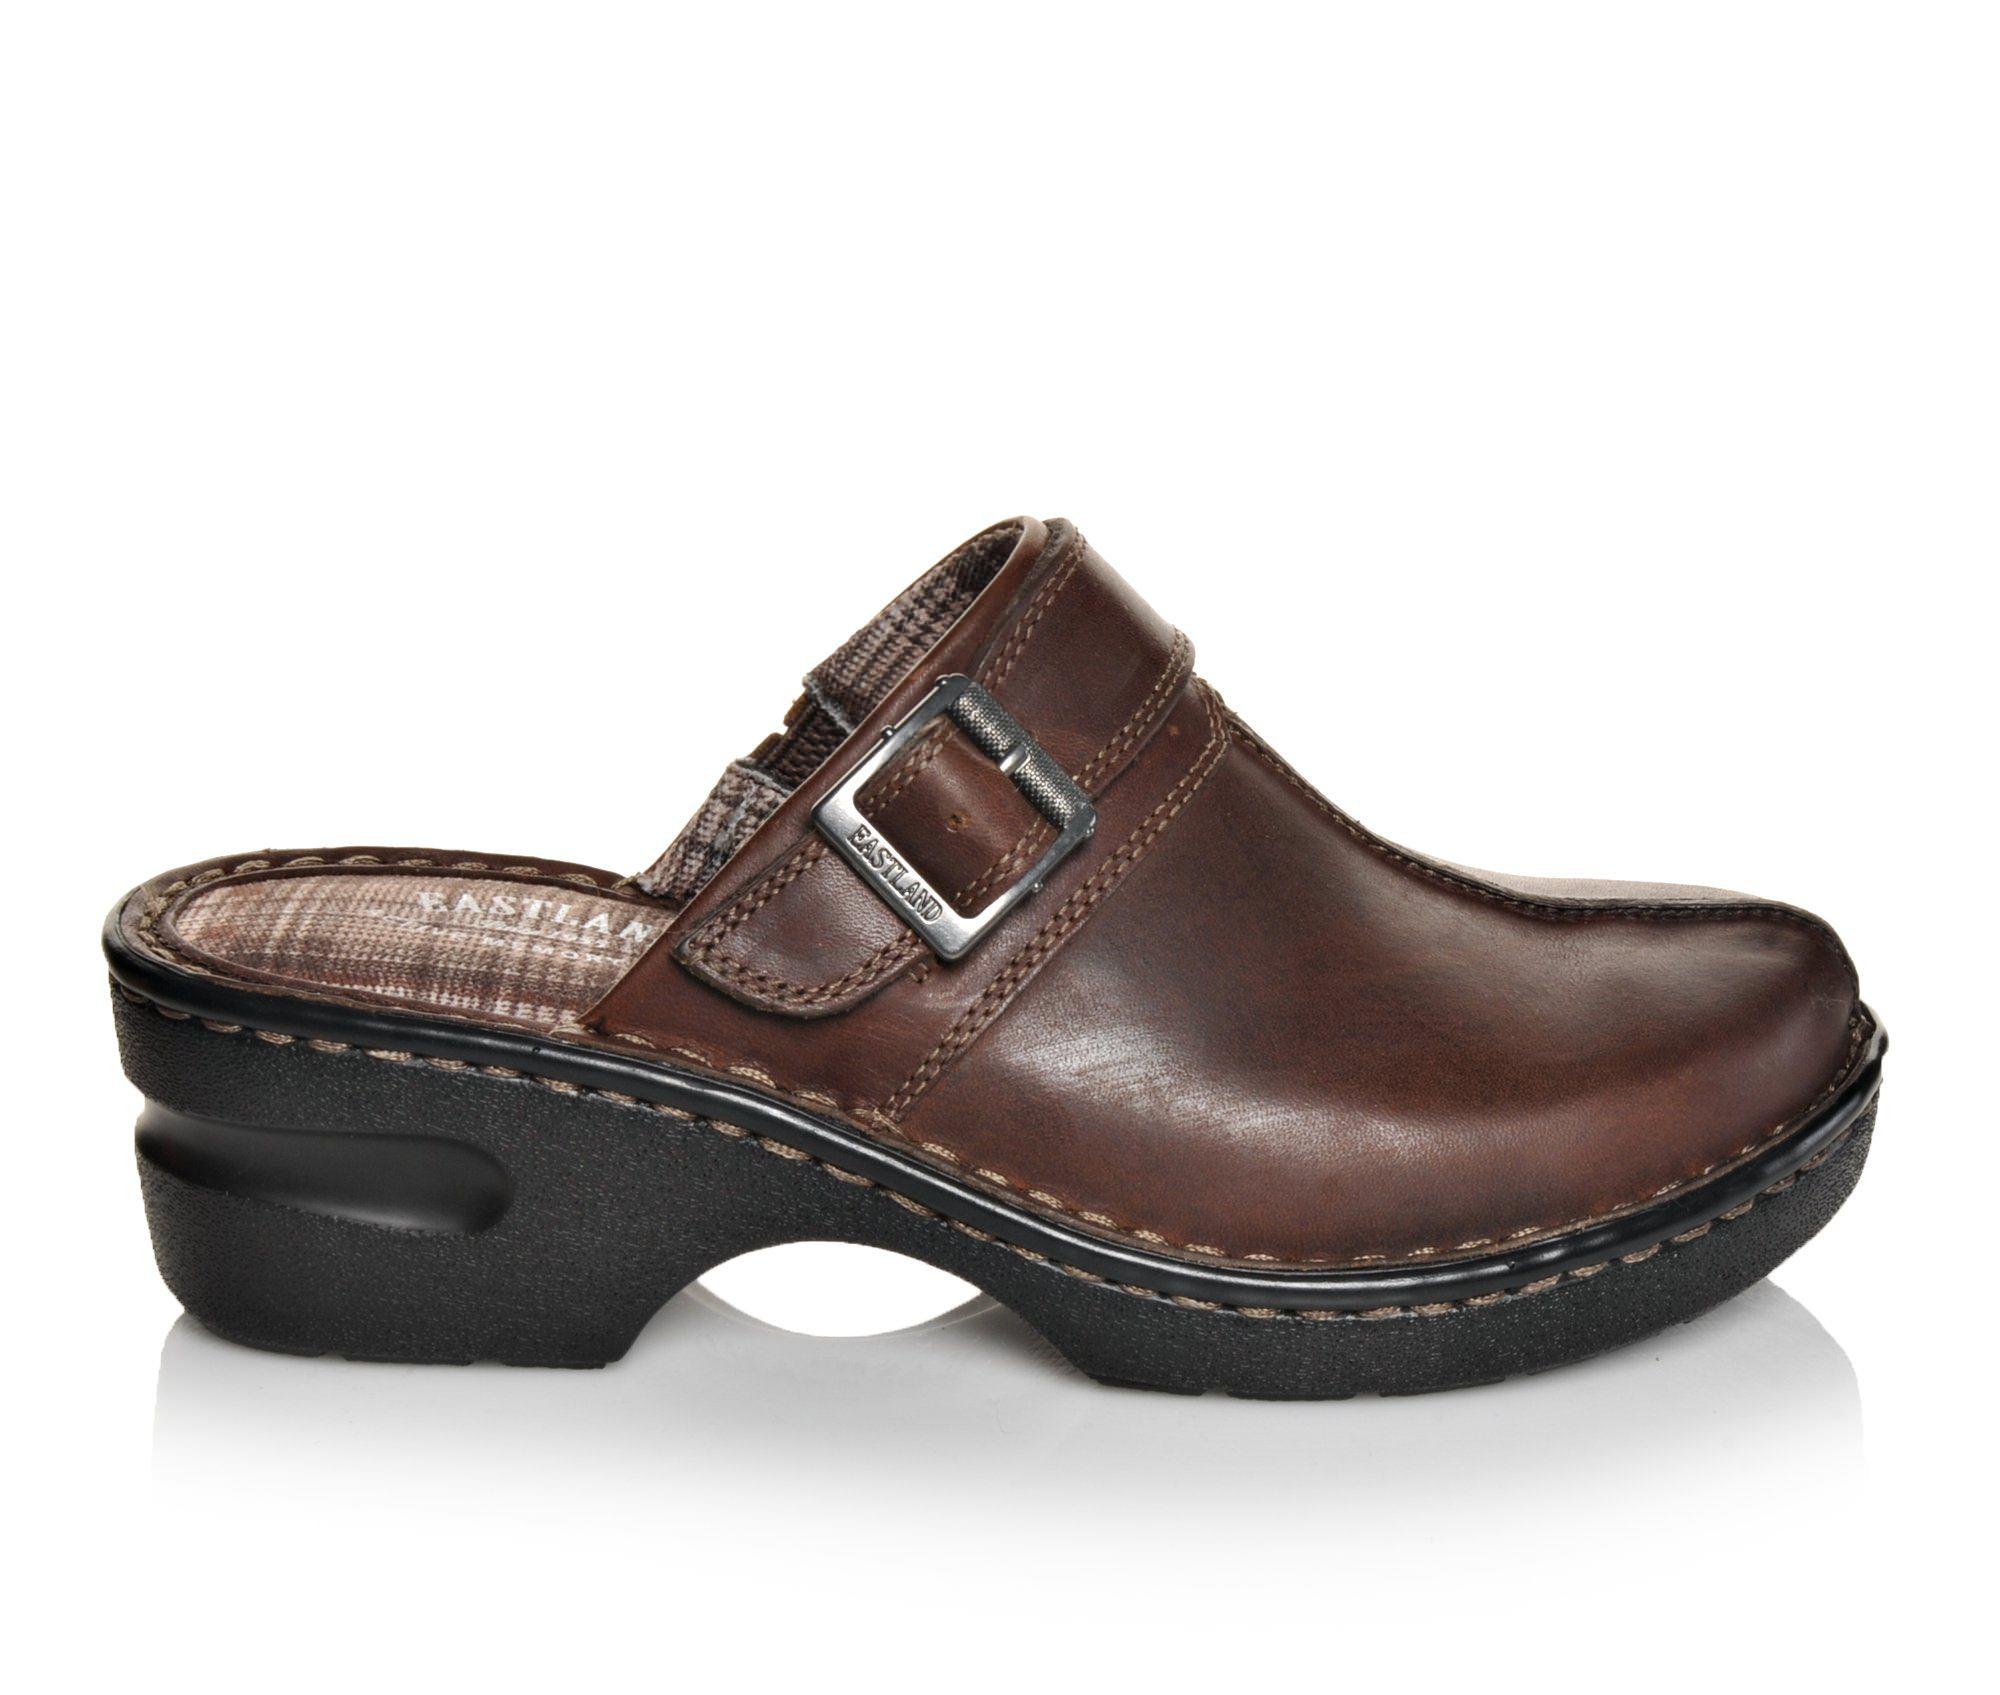 Eastland Mae Women's Shoe (Brown Leather)